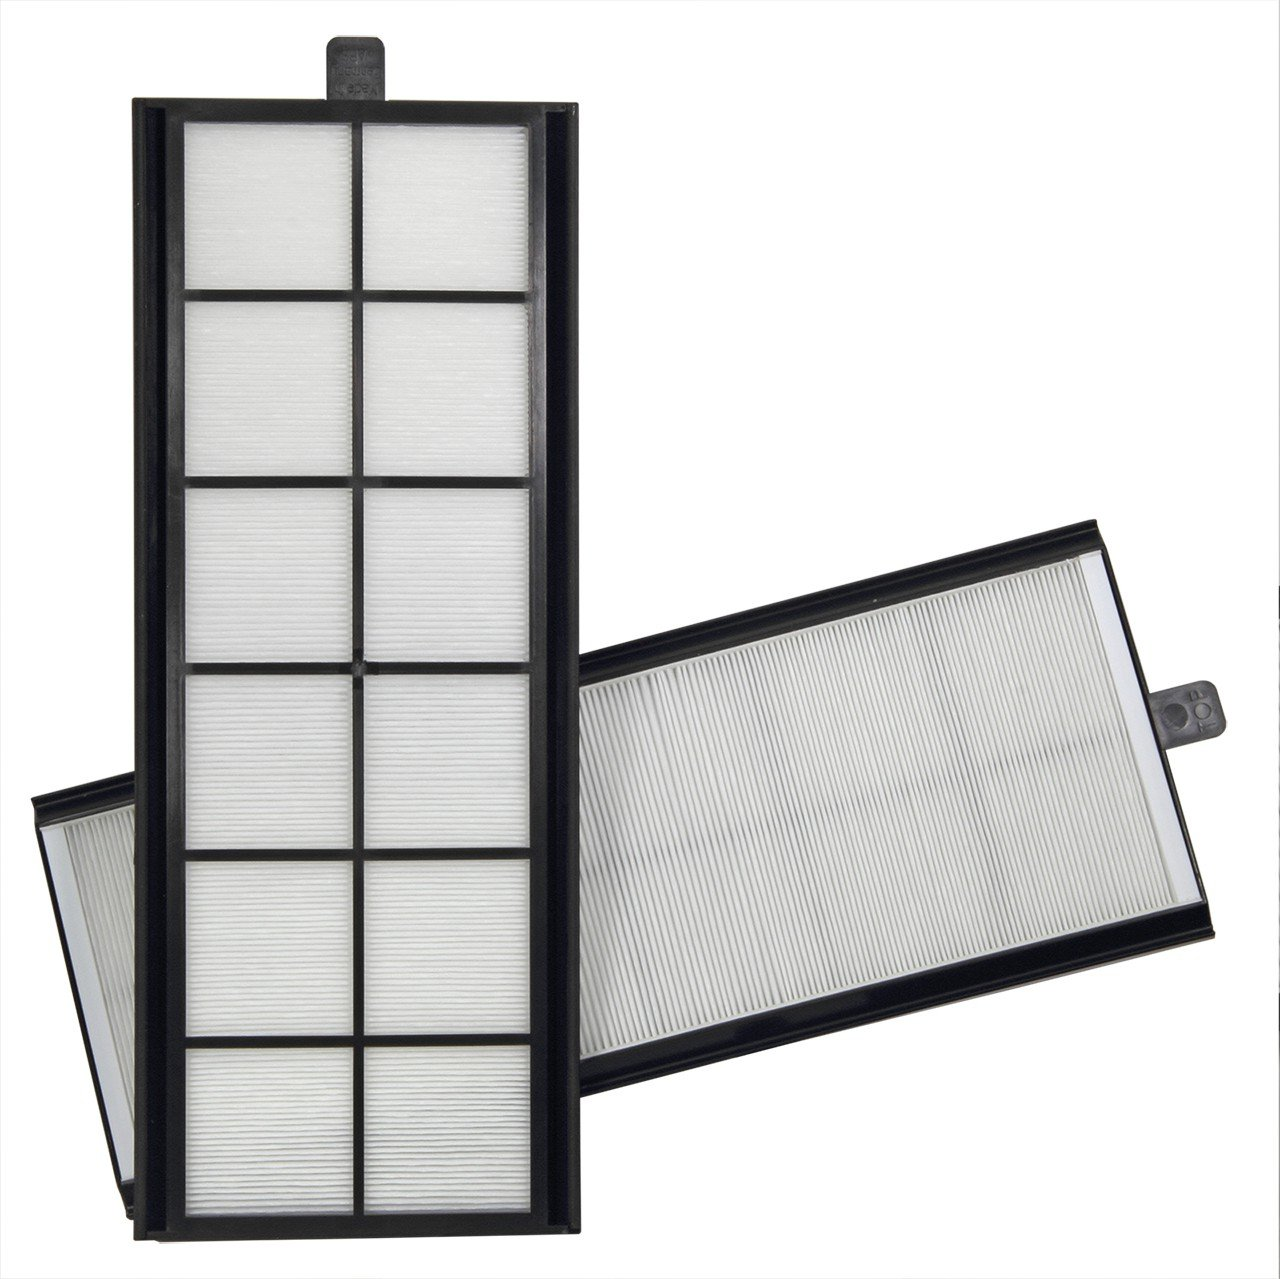 Filterset G4 fü r Zehnder ComfoAir 350/550 (2x) Selfio